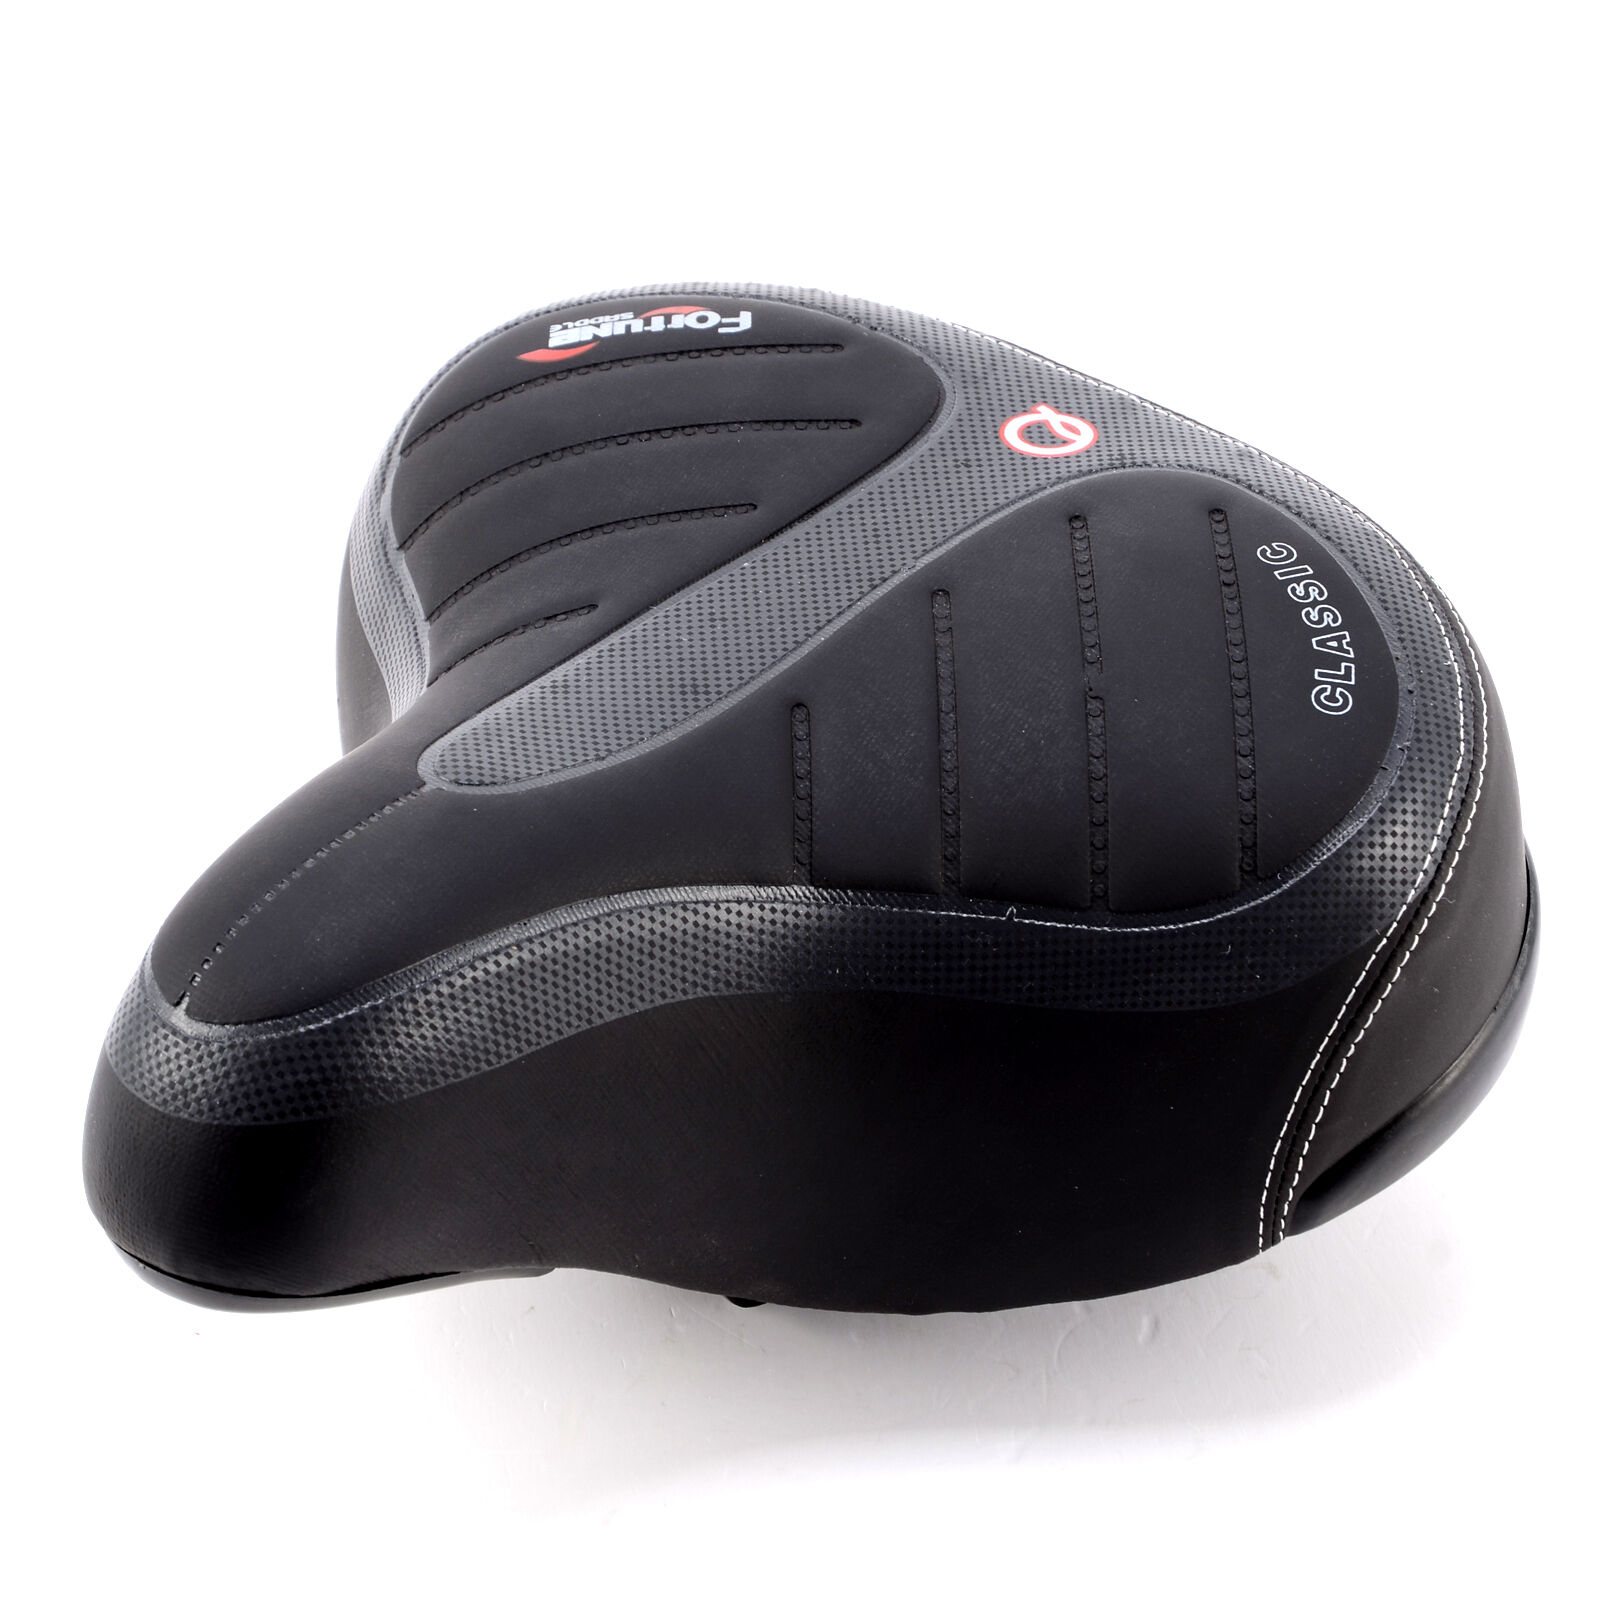 2x Wide Bike Bicycle Gel Comfort Soft Suspension Spring Saddle MTB Padded Seat